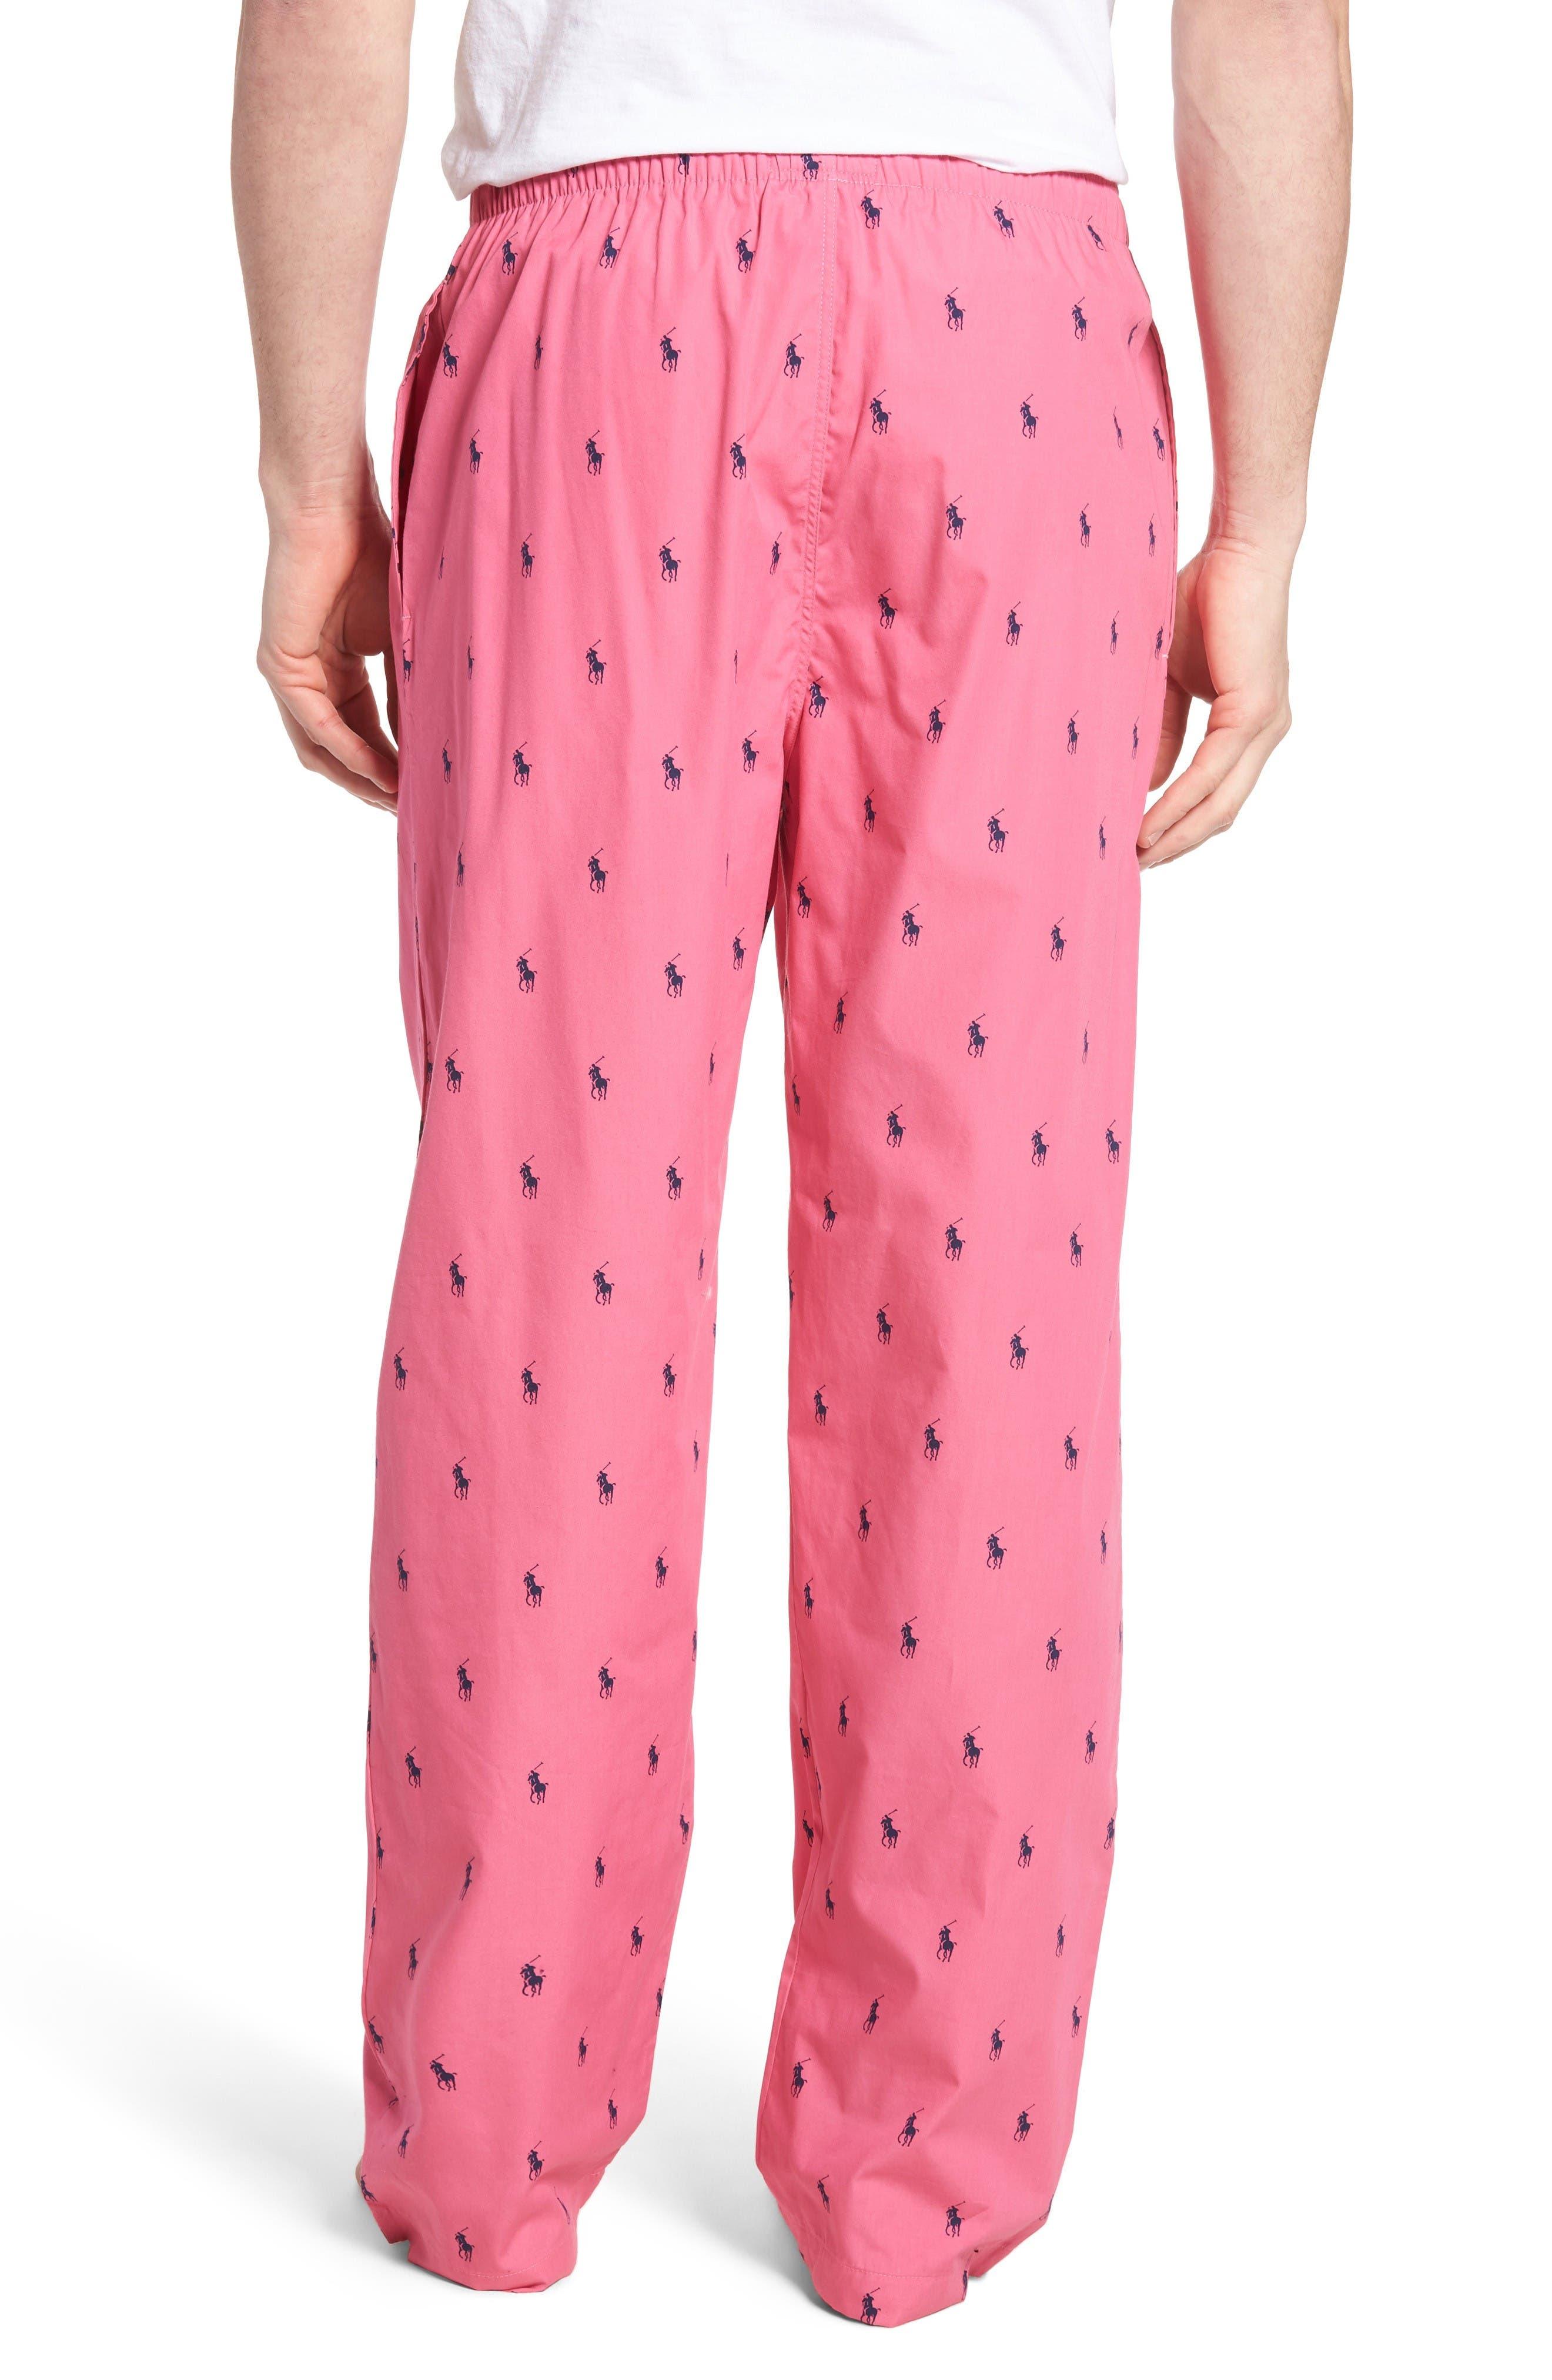 Cotton Lounge Pants,                             Alternate thumbnail 2, color,                             Madison Pink